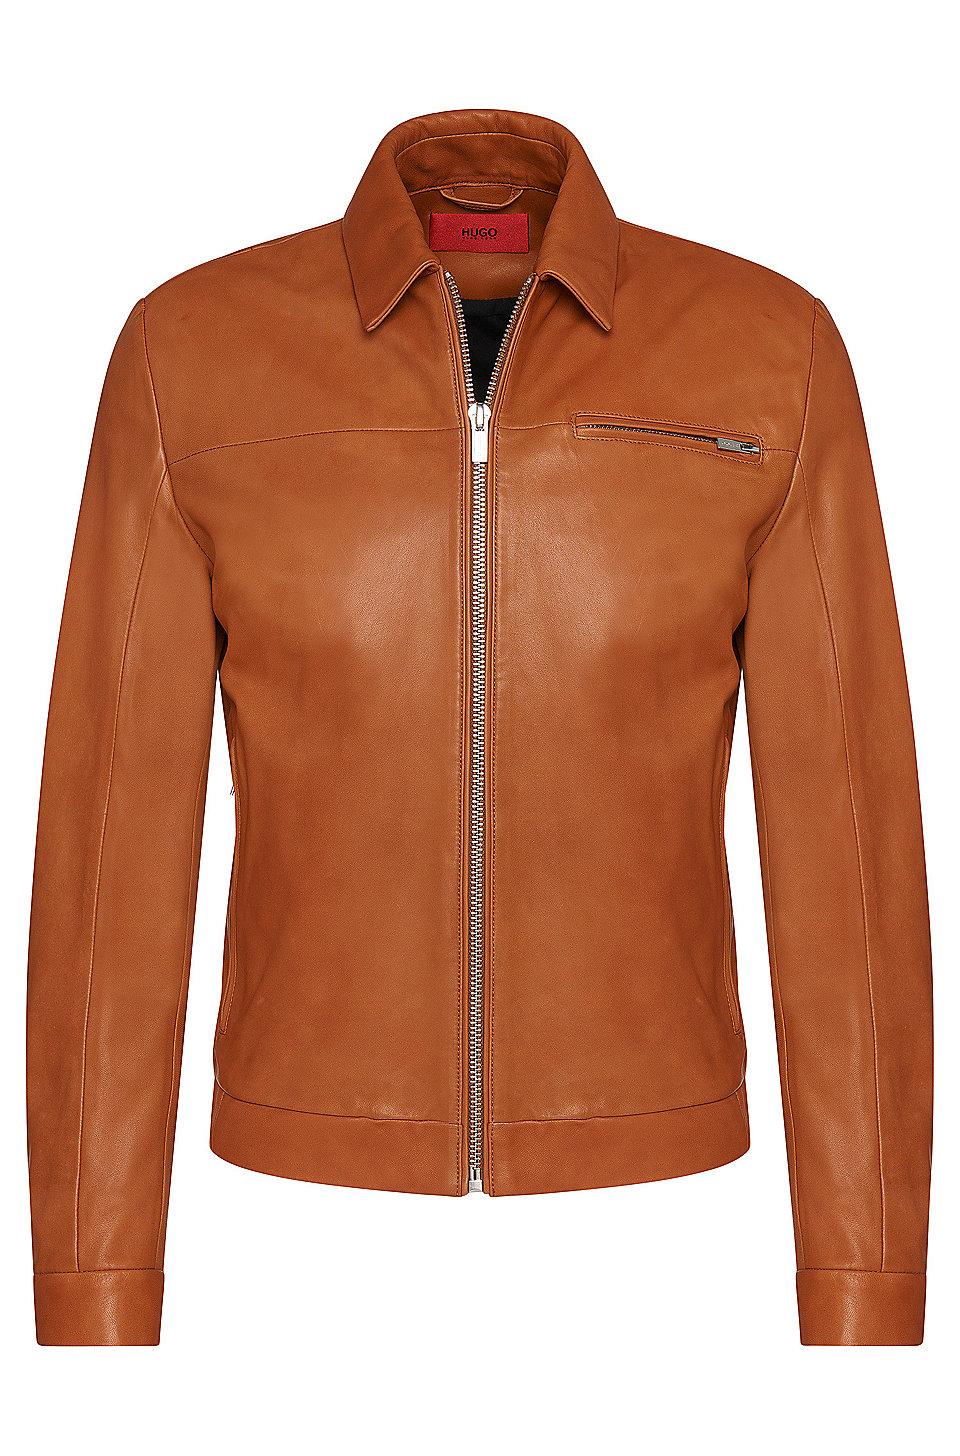 Mens leather gloves boss -  Latnik Lambskin Nappa Leather Jacket